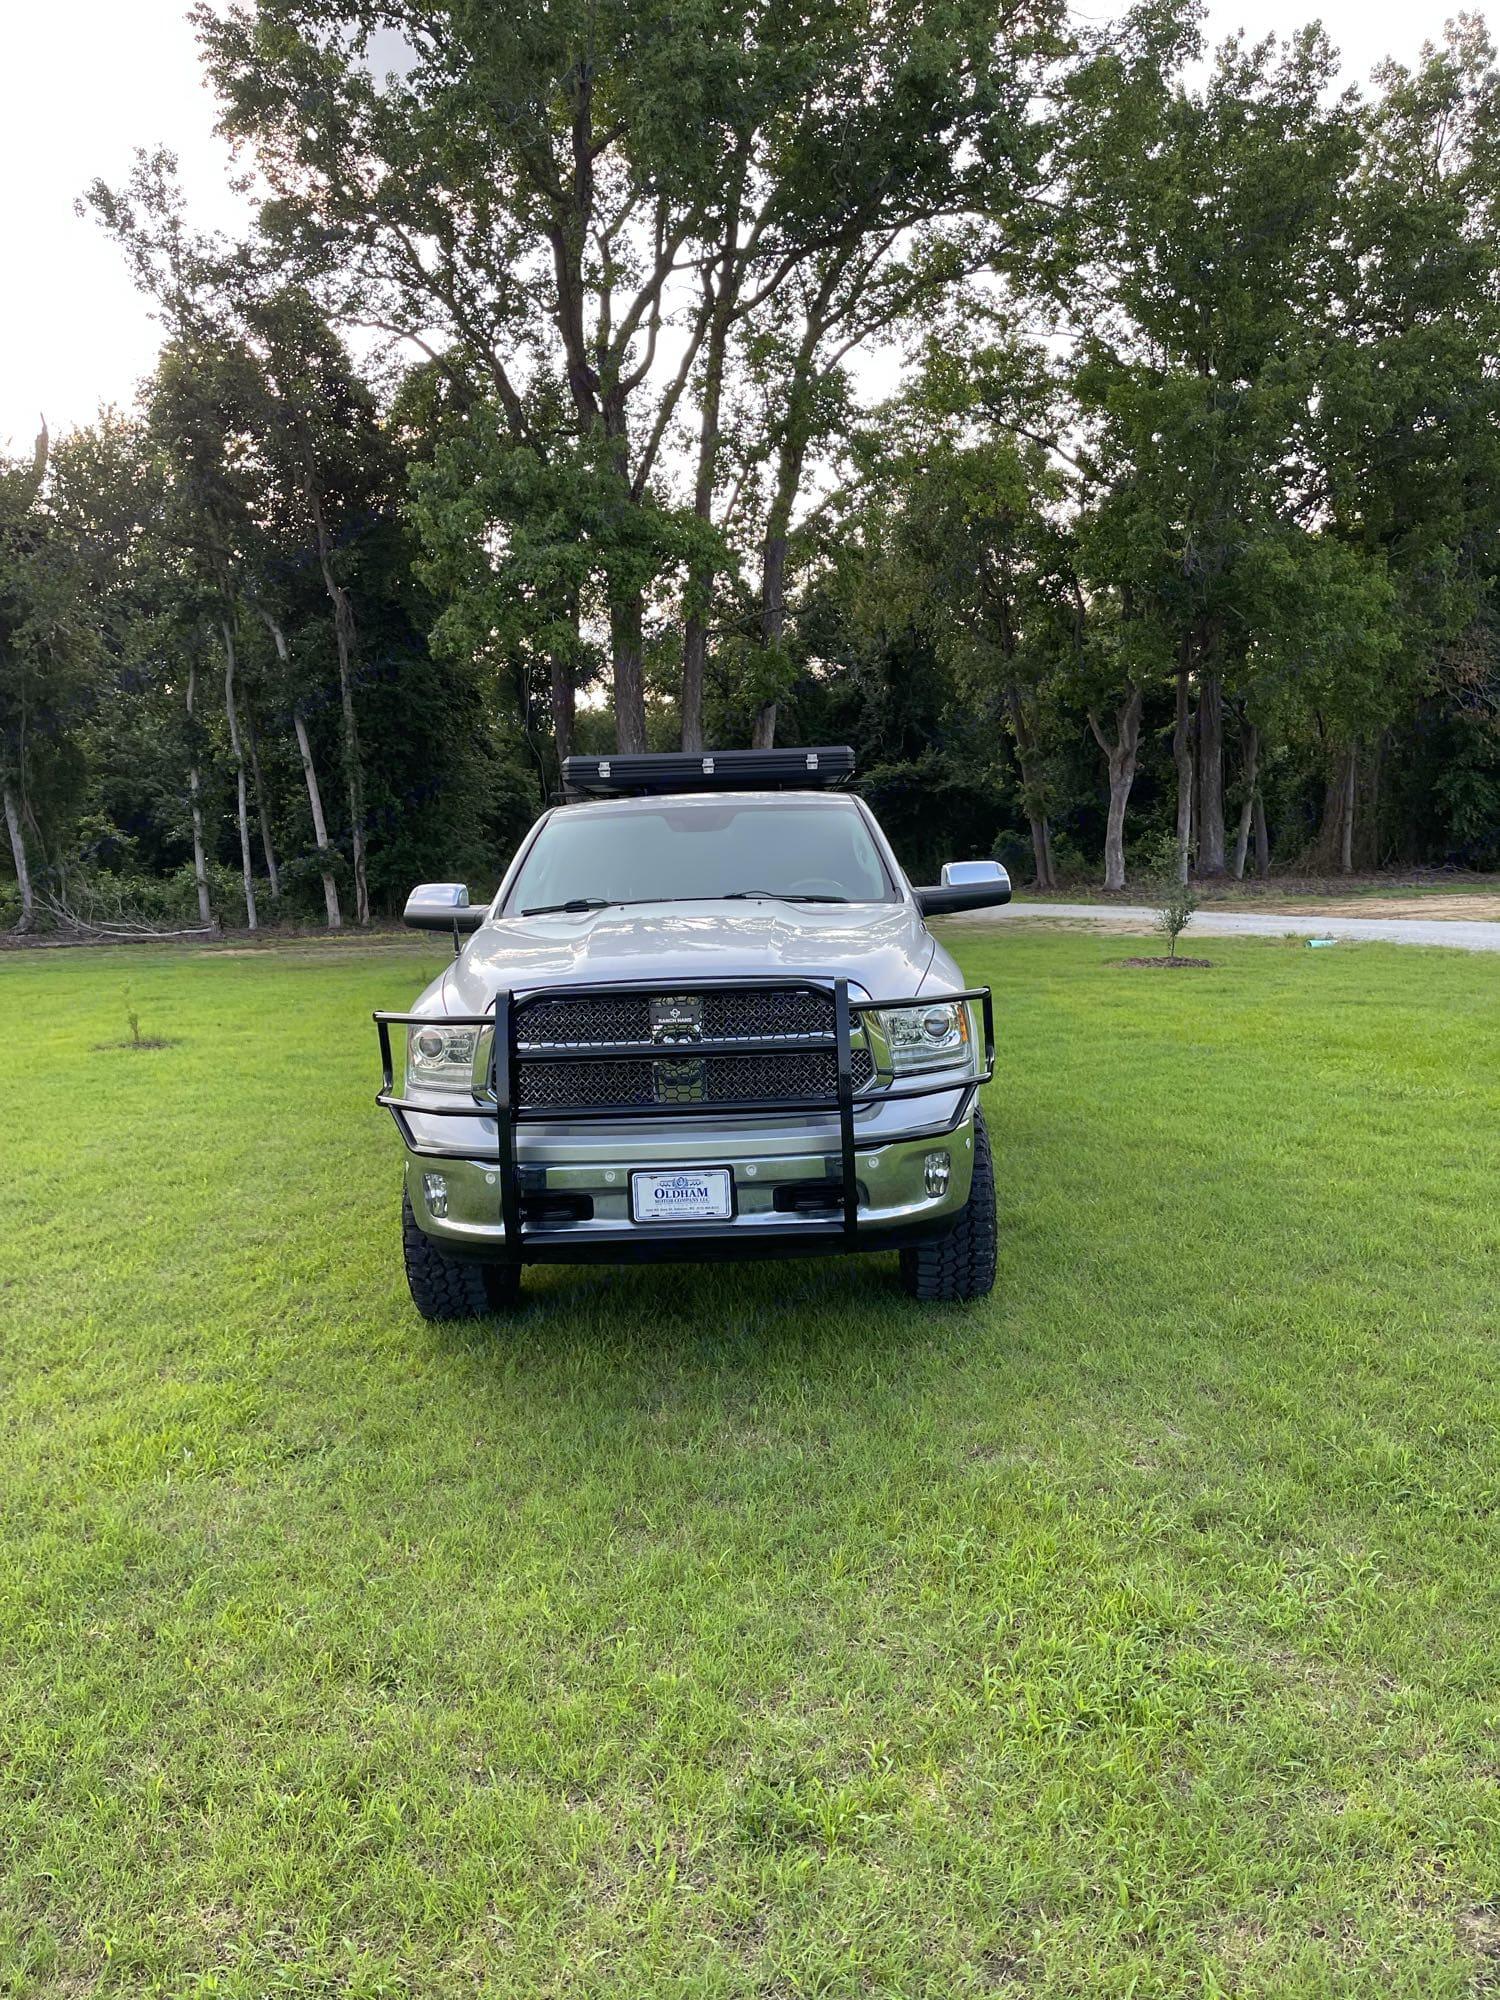 Ram 1500 Texas Edition Eco Diesel Crew Cab4x4 2015